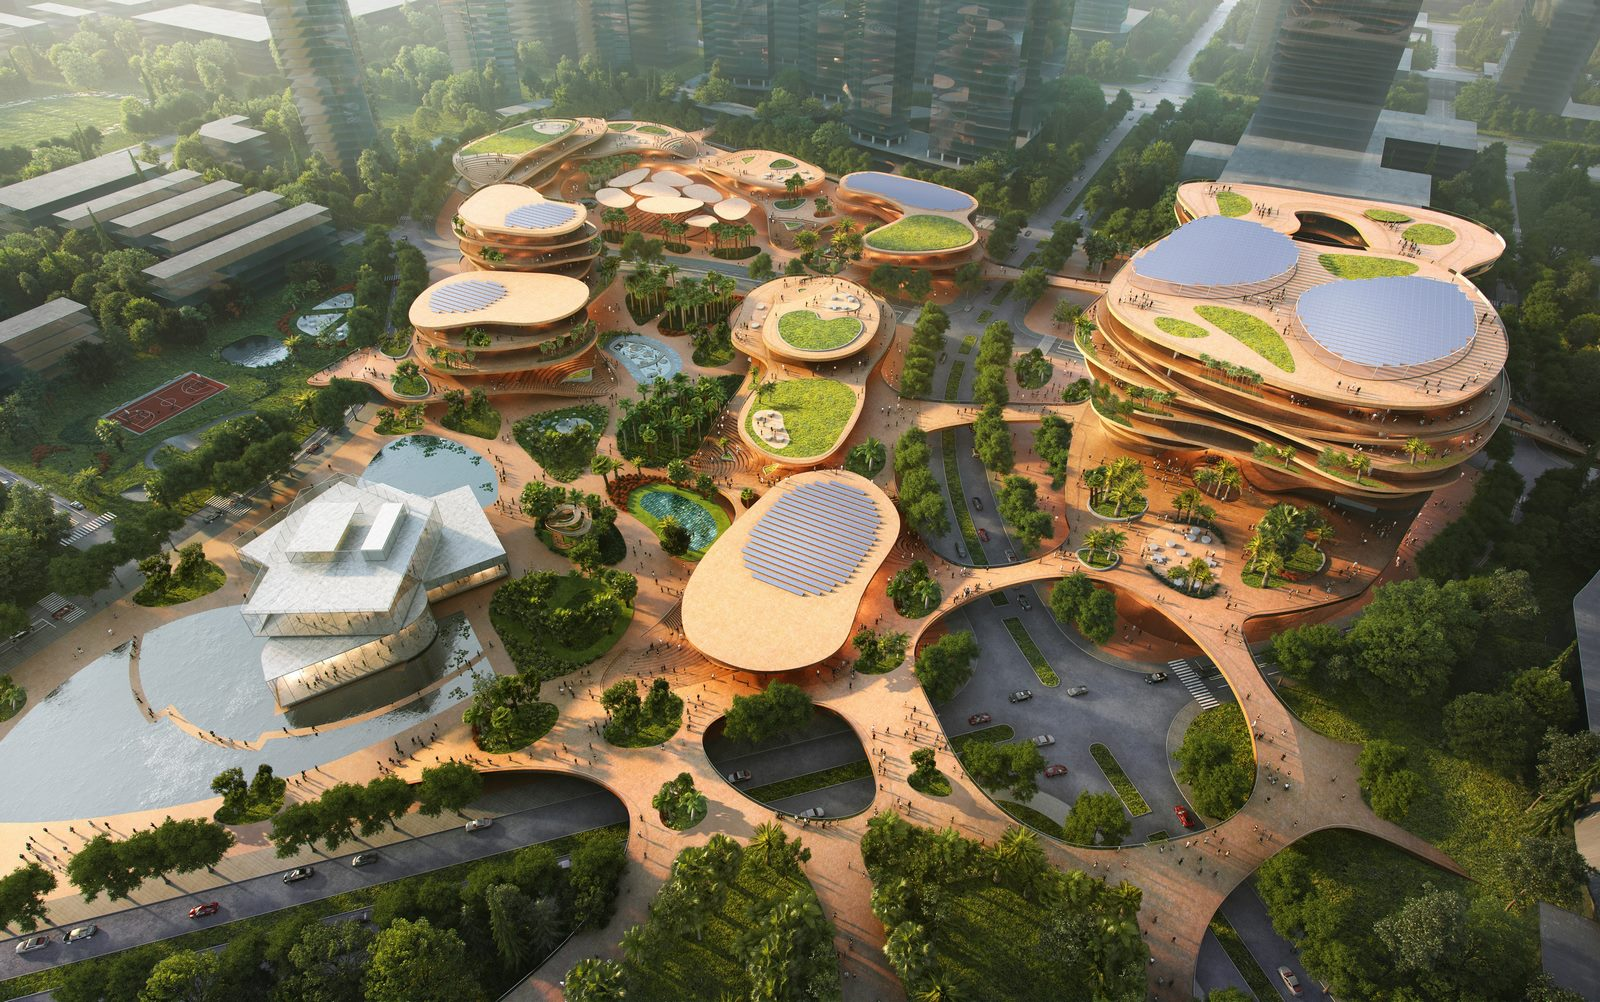 MVRDV gana la competencia con Shenzhen Terraces, una sala de estar urbana de varios niveles en Shenzhen, China 9